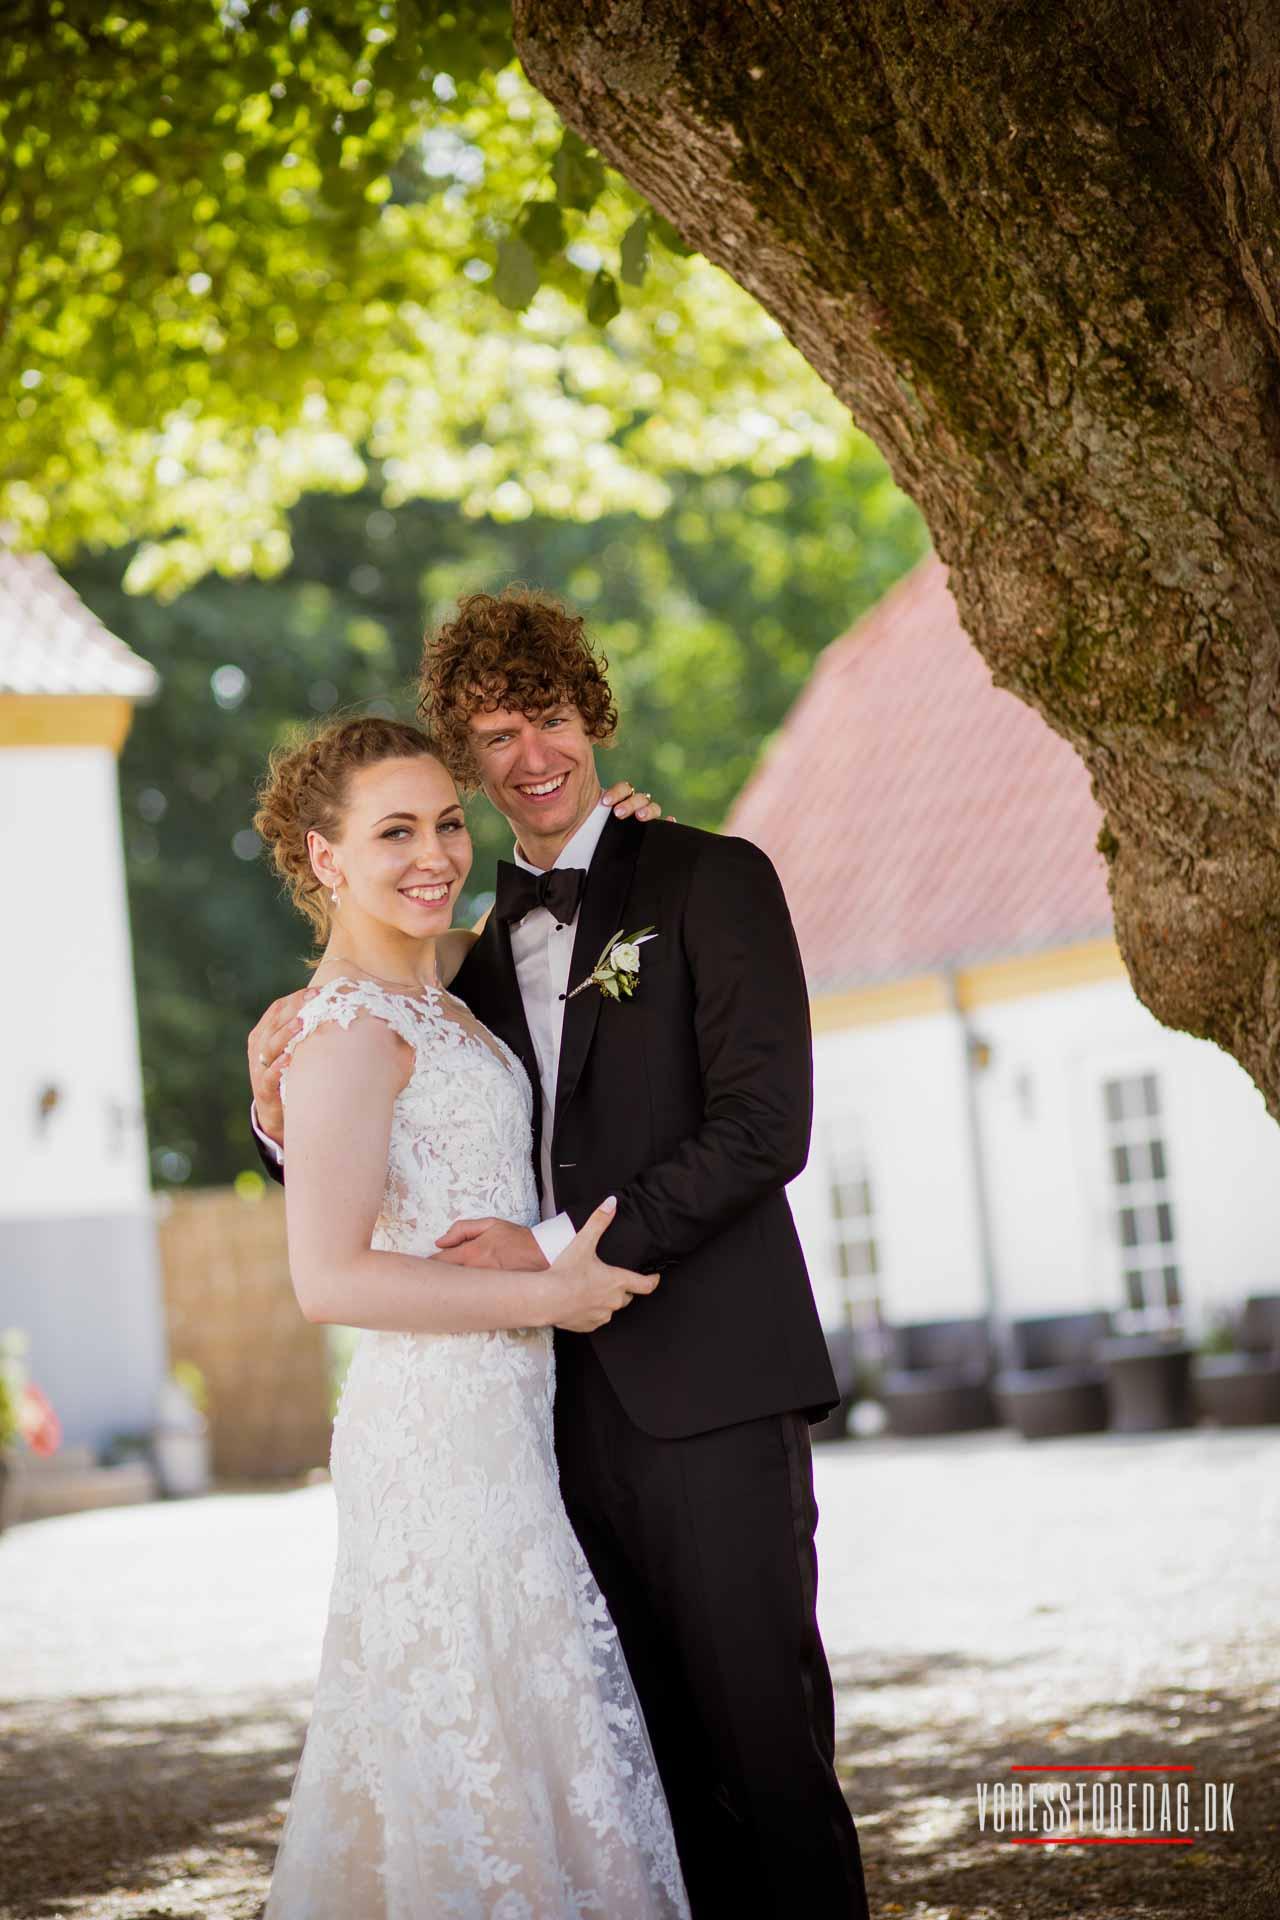 Bryllupskørsel i Nordjylland